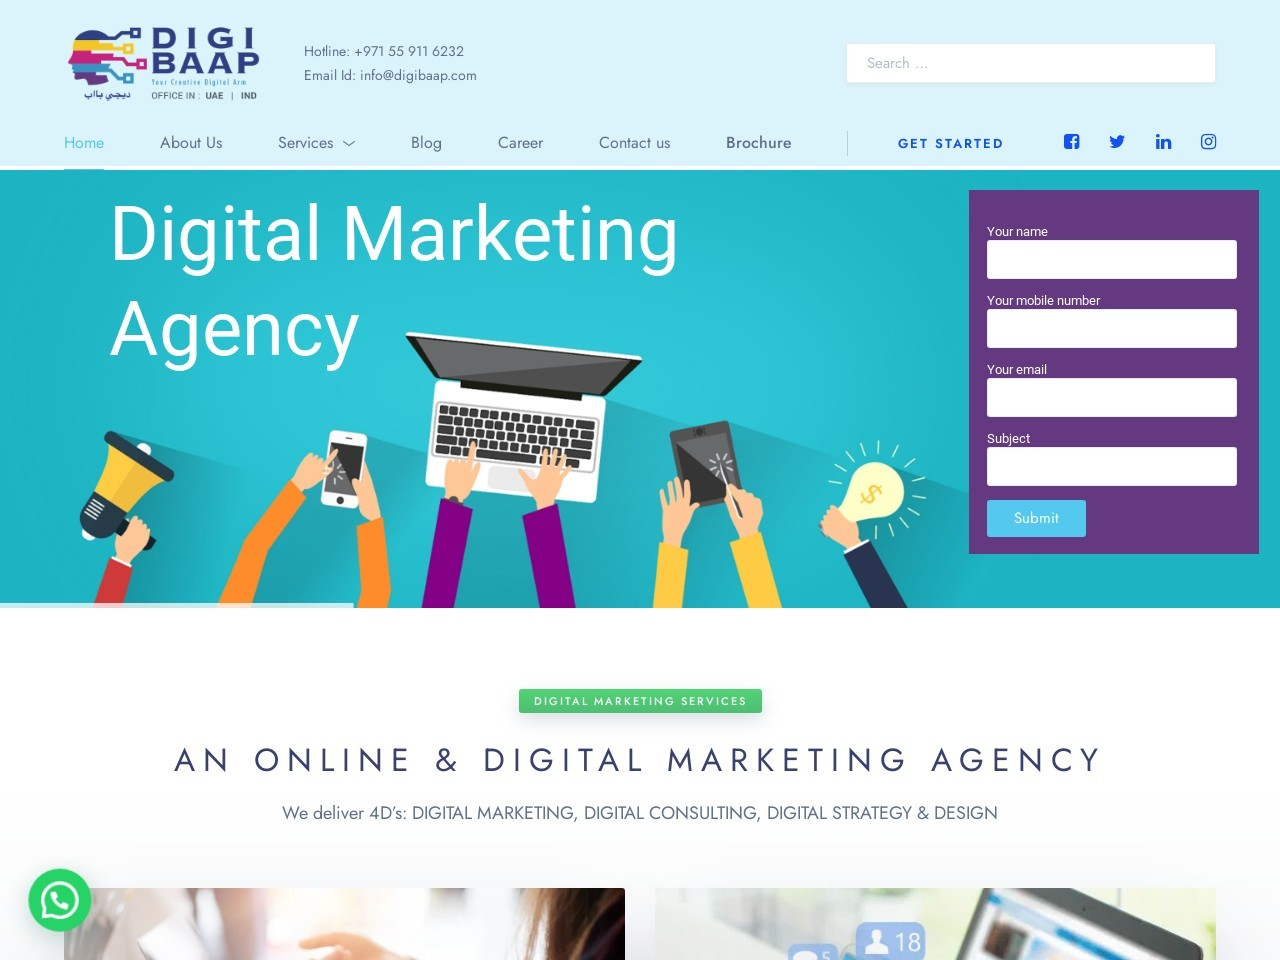 Branding Agency in Dubai | Branding Agecny UAE Digibaap